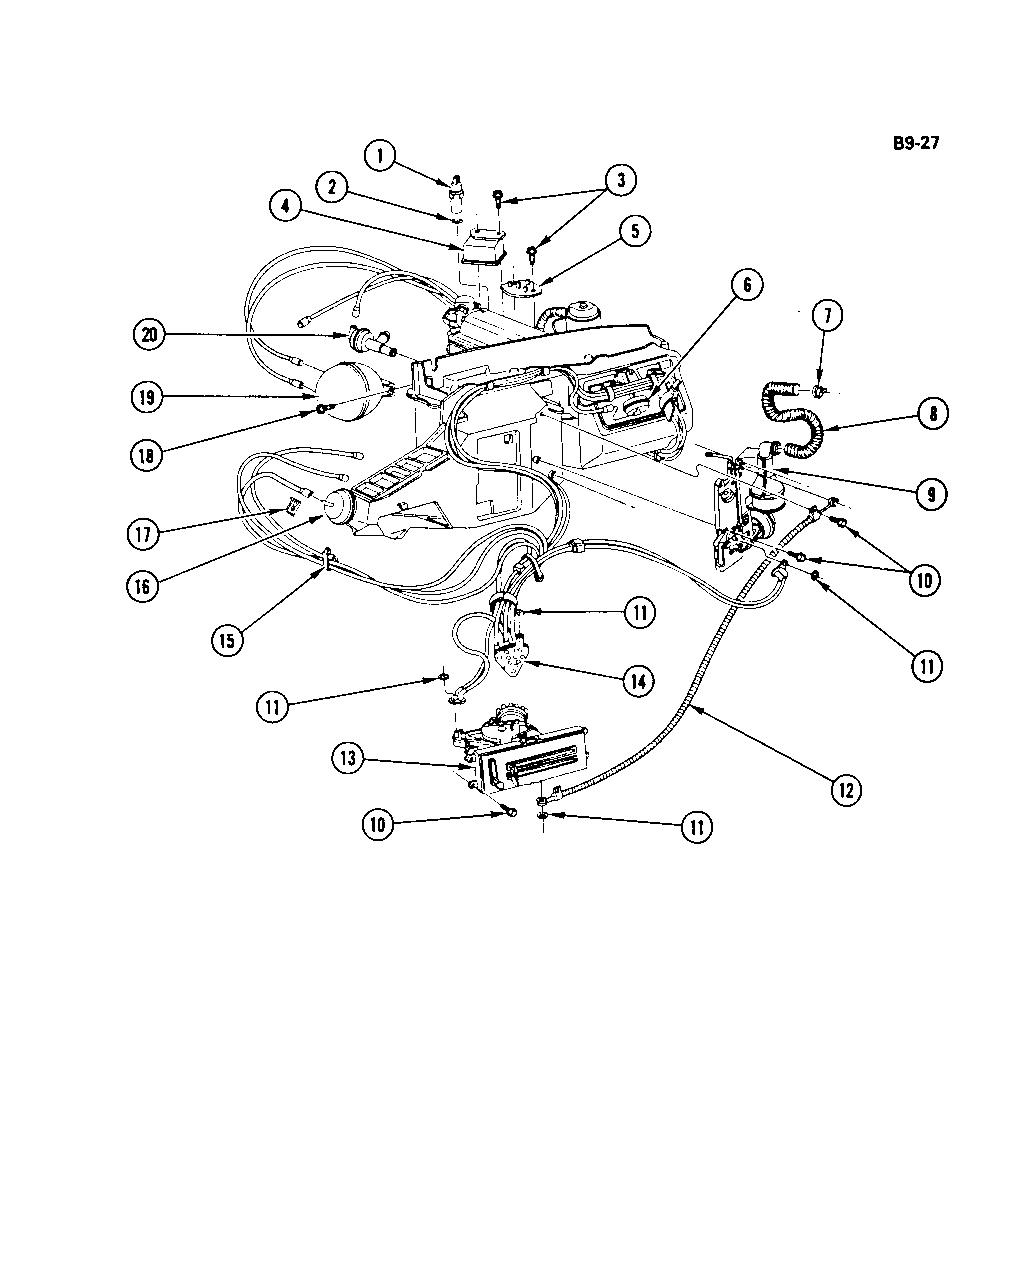 Auto Air Conditioning Parts Diagram